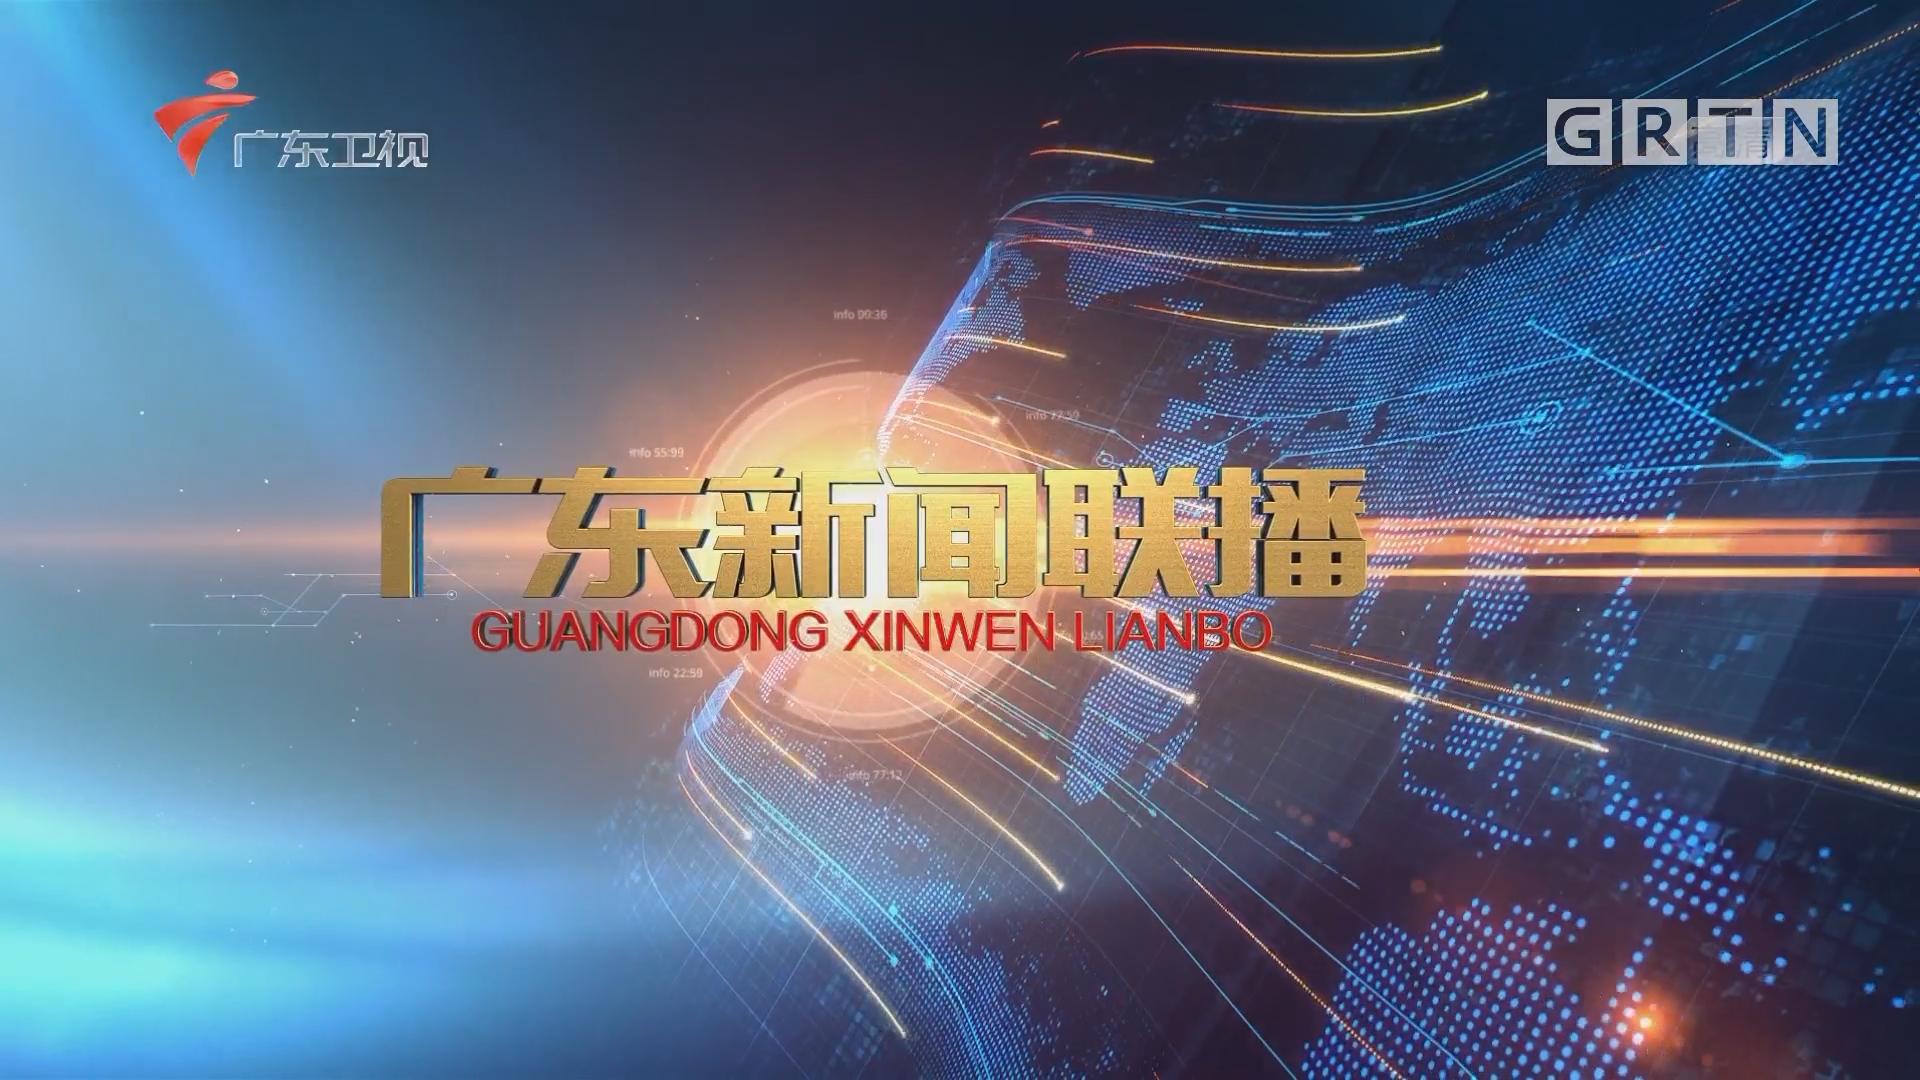 [HD][2019-02-12]广东新闻联播:省委常委会召开会议